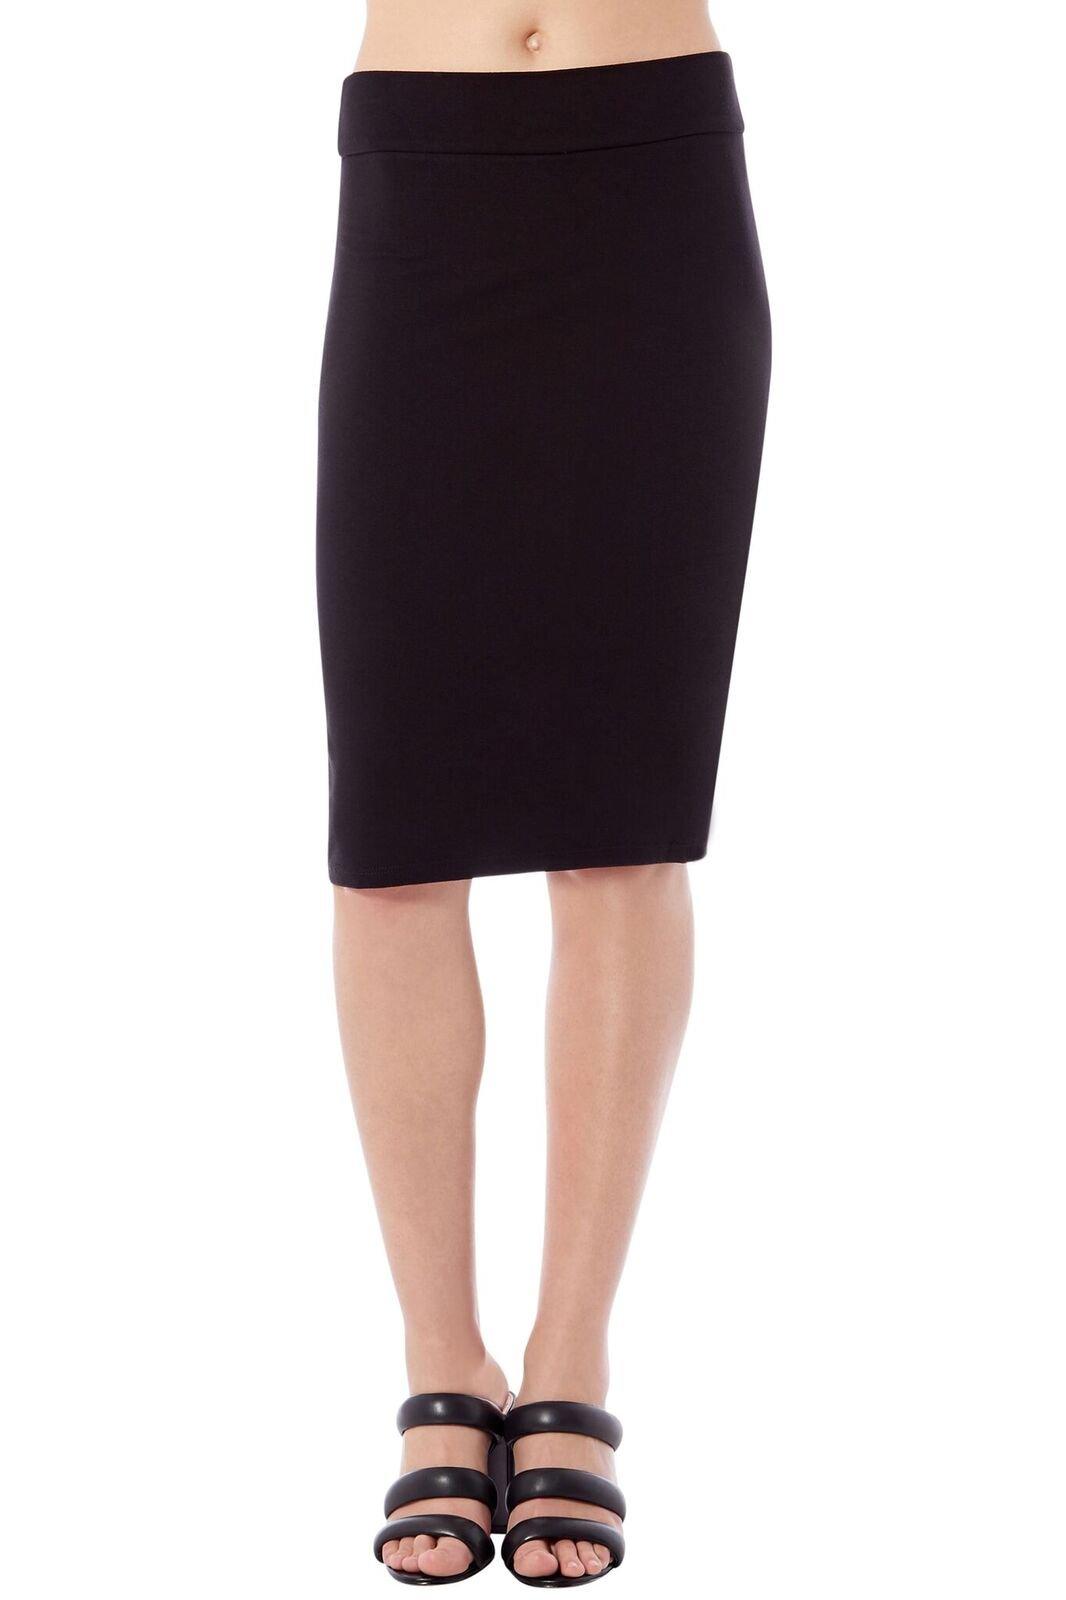 Rohb Joyce Azria Riviera Straight Pencil Tube Skirt (Black) Size M